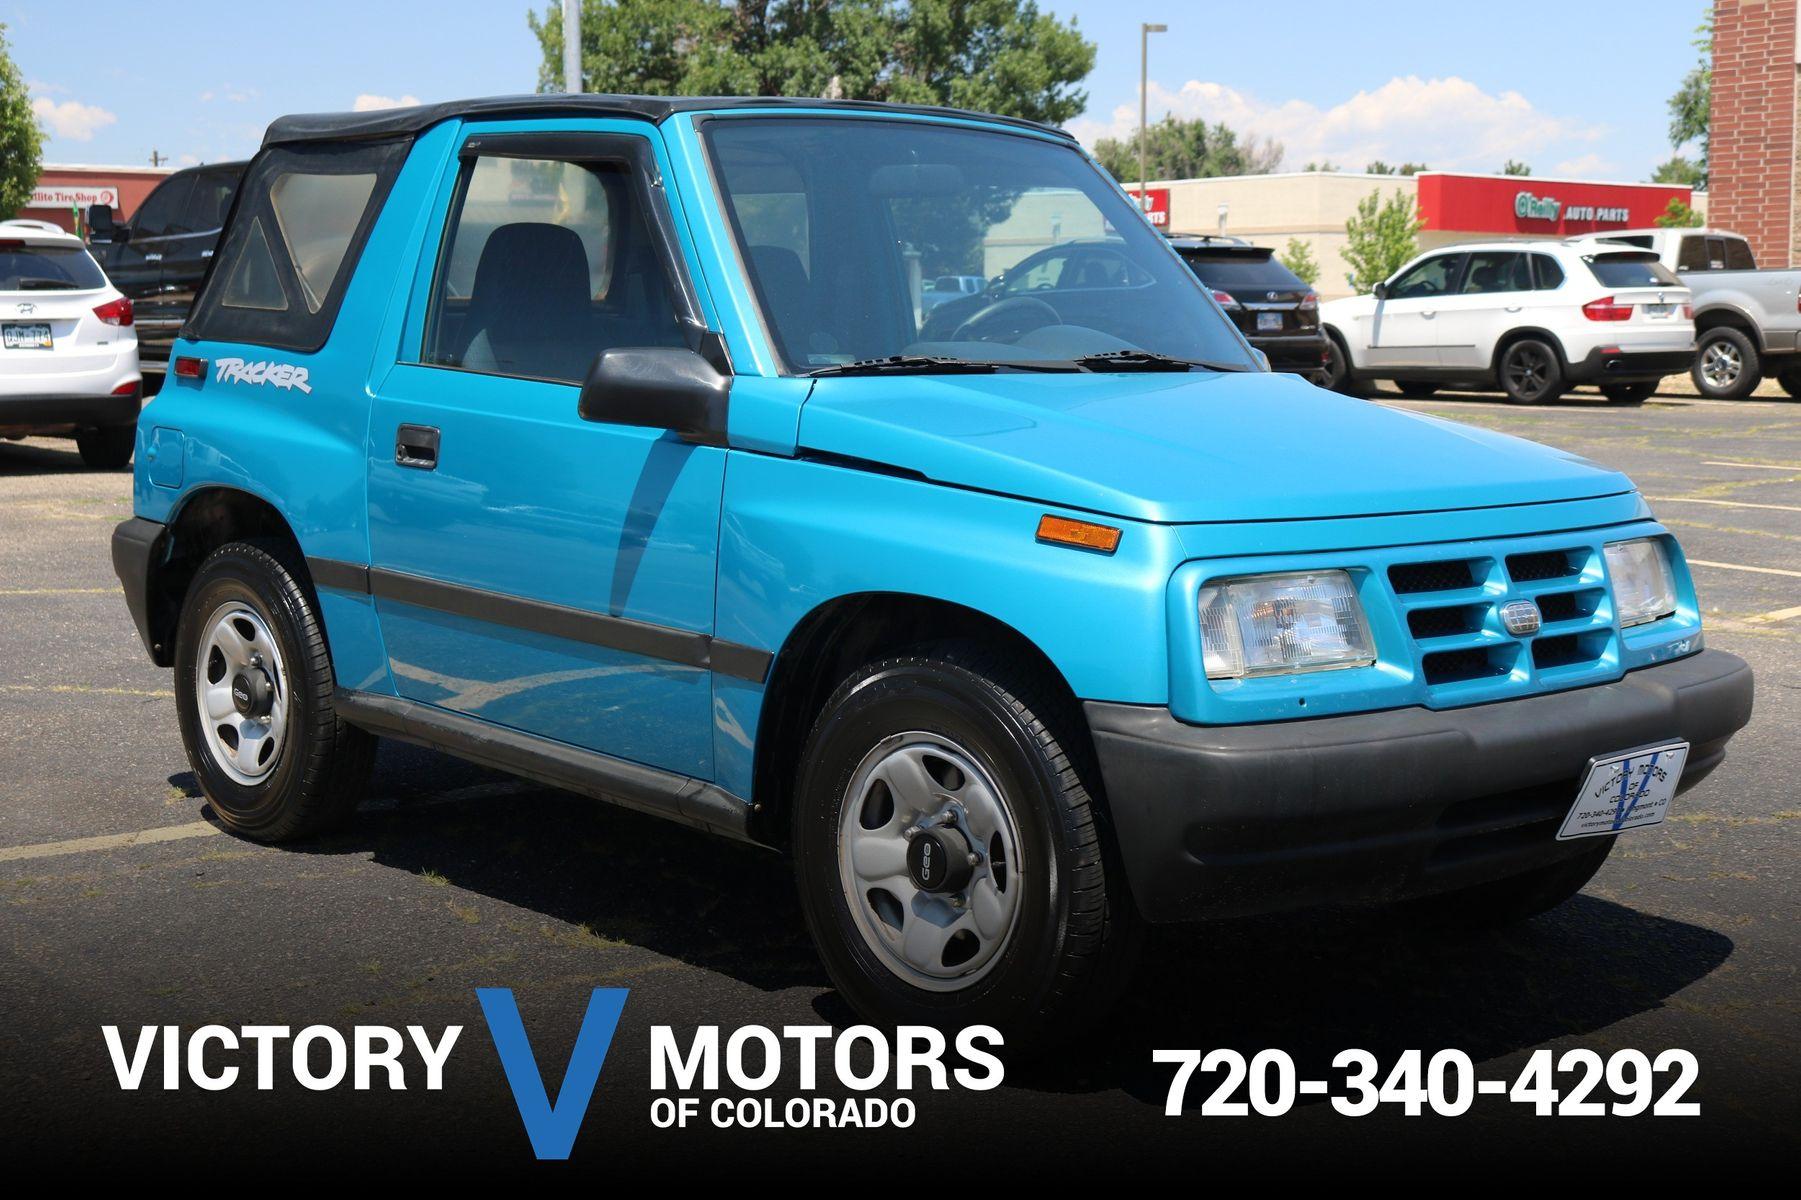 1997 geo tracker soft top victory motors of colorado for Victory motors trucks longmont